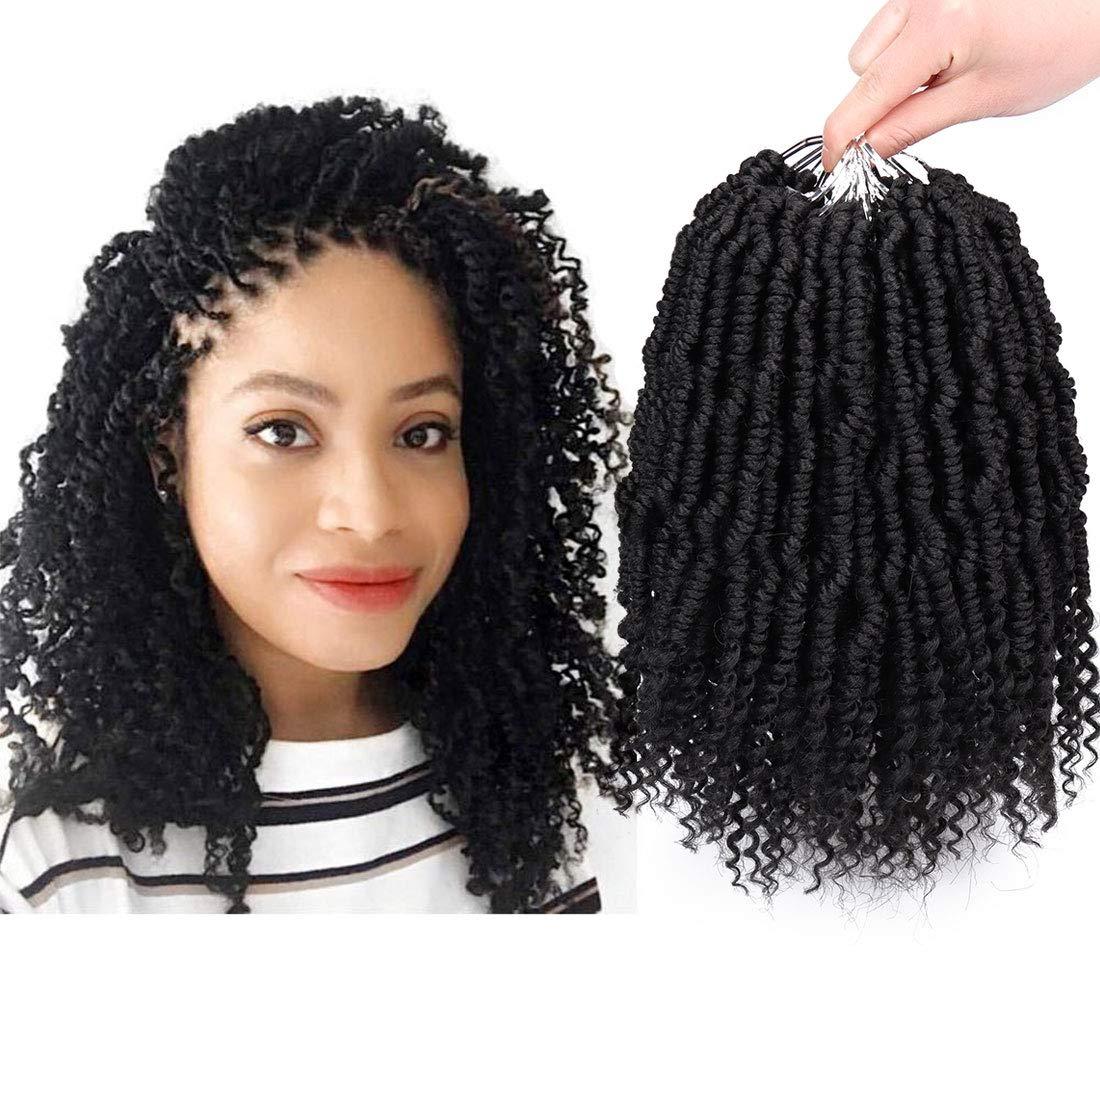 Liyate Bomb Twist Crochet Hair 10 Inch 6 Packs Spring Twist Braiding Hair Pretwisted Passion Twist Crochet Braids Passion Twist Mini Twist Hair with Curly End(1B)